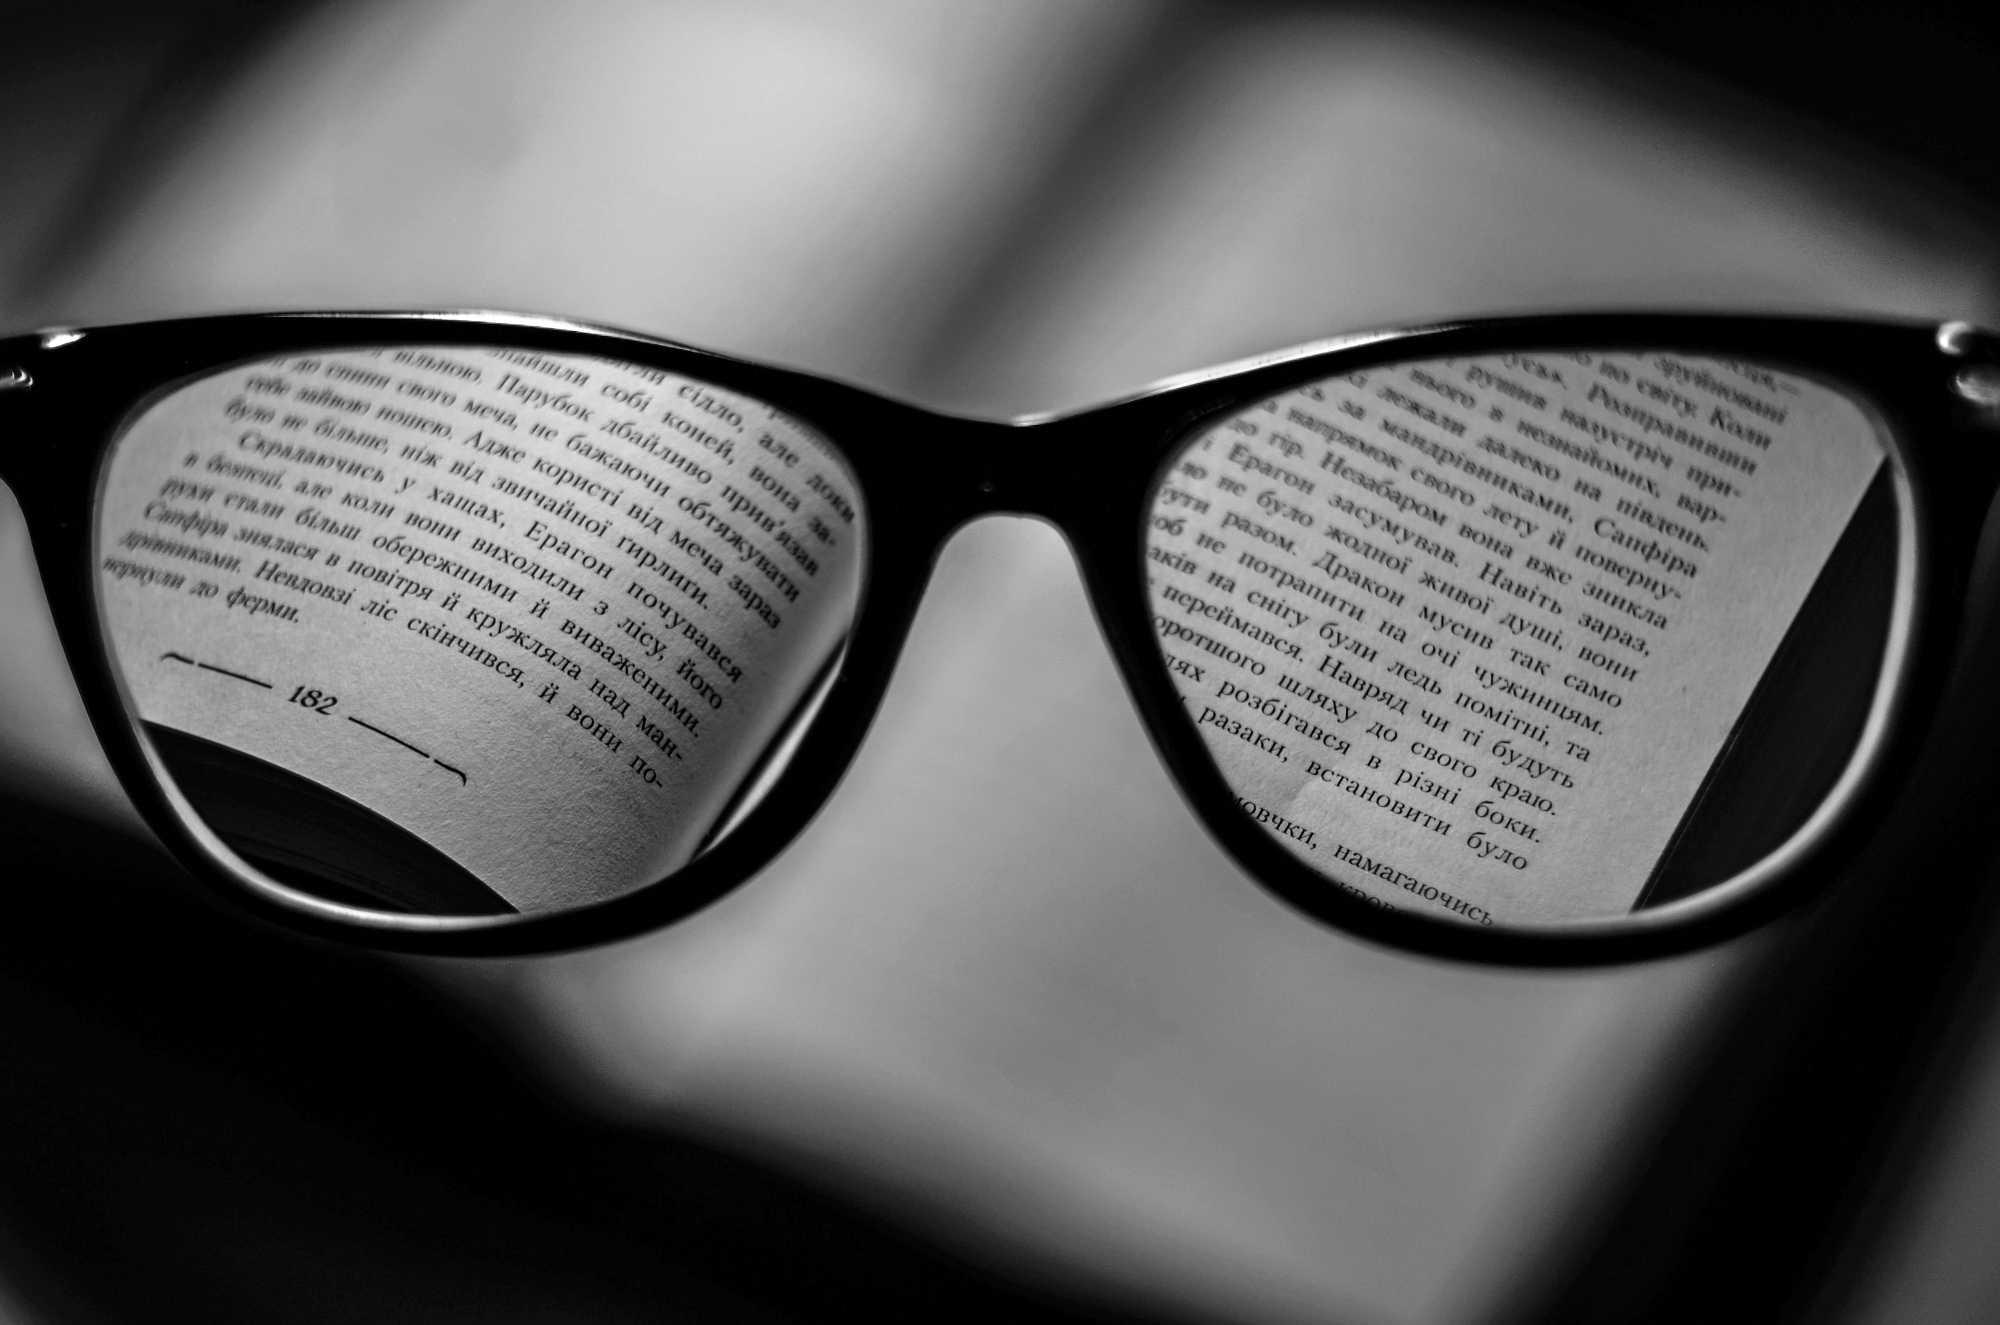 Occhiali su libro in lingua ucraina | © Dmitry Ratushny